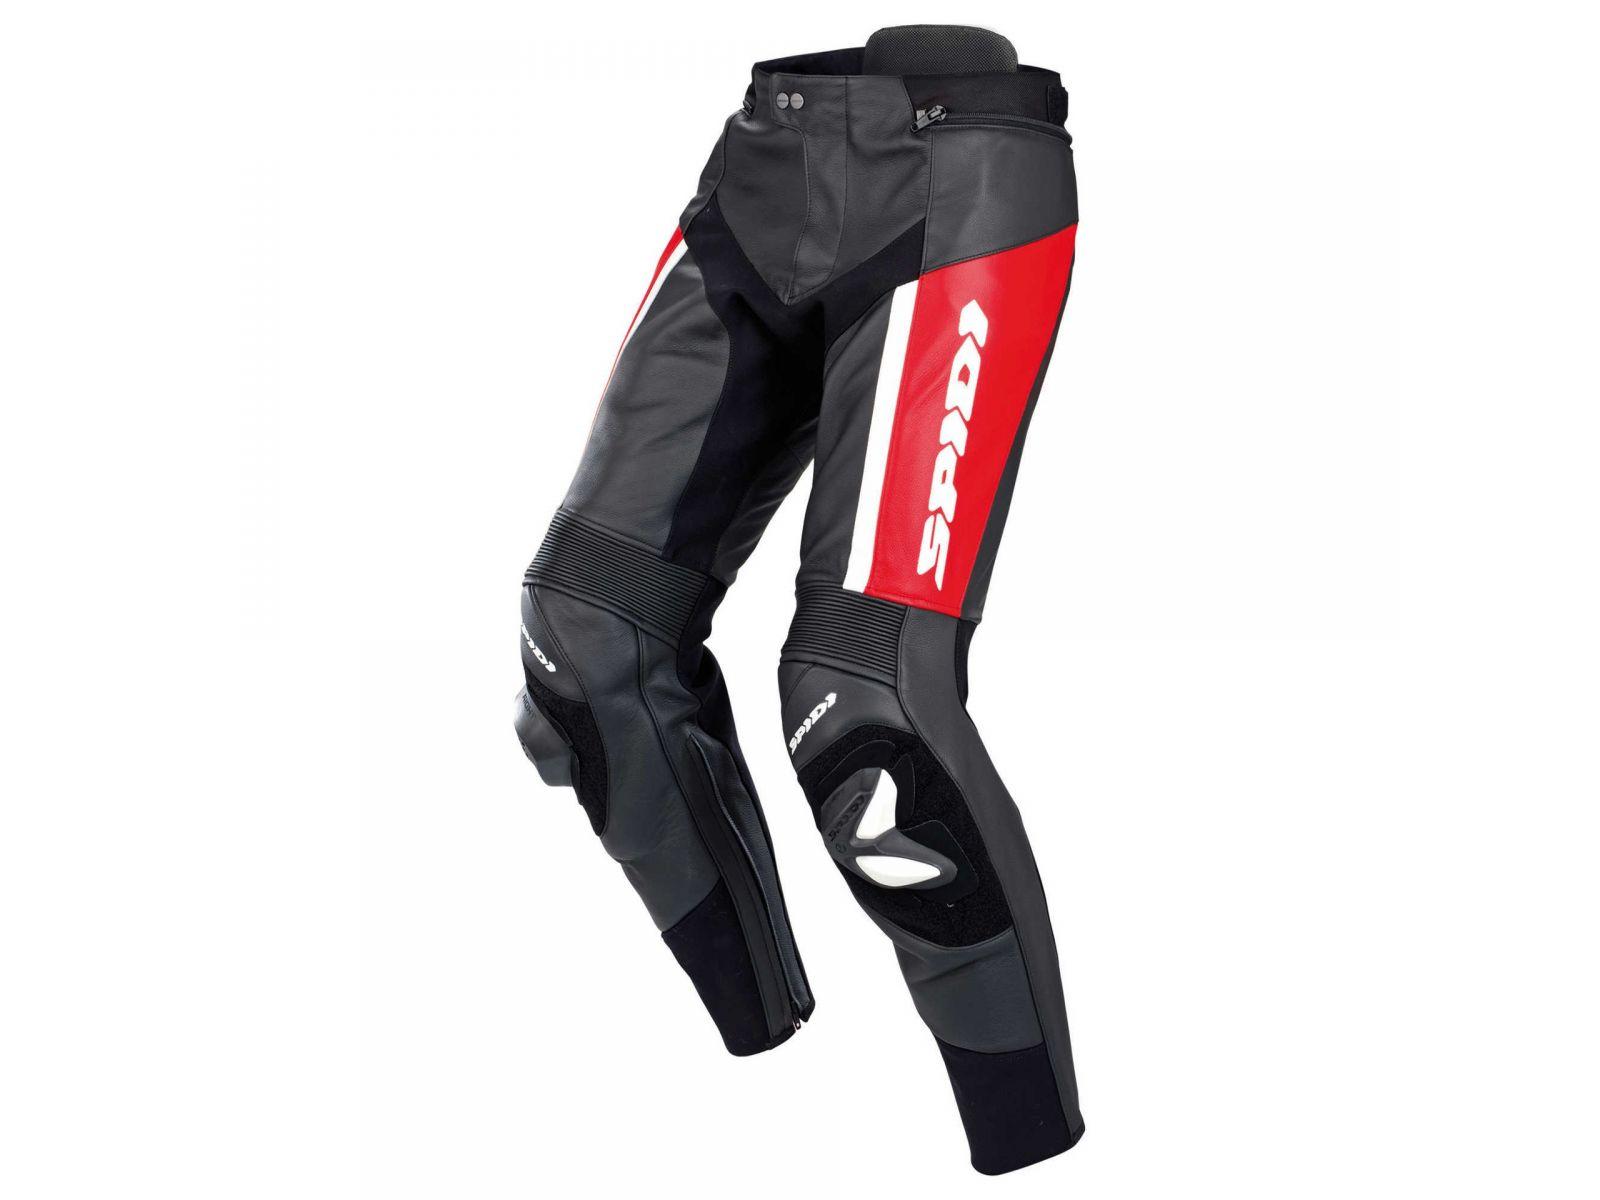 Мотобрюки SPIDI RR PRO Black/Red